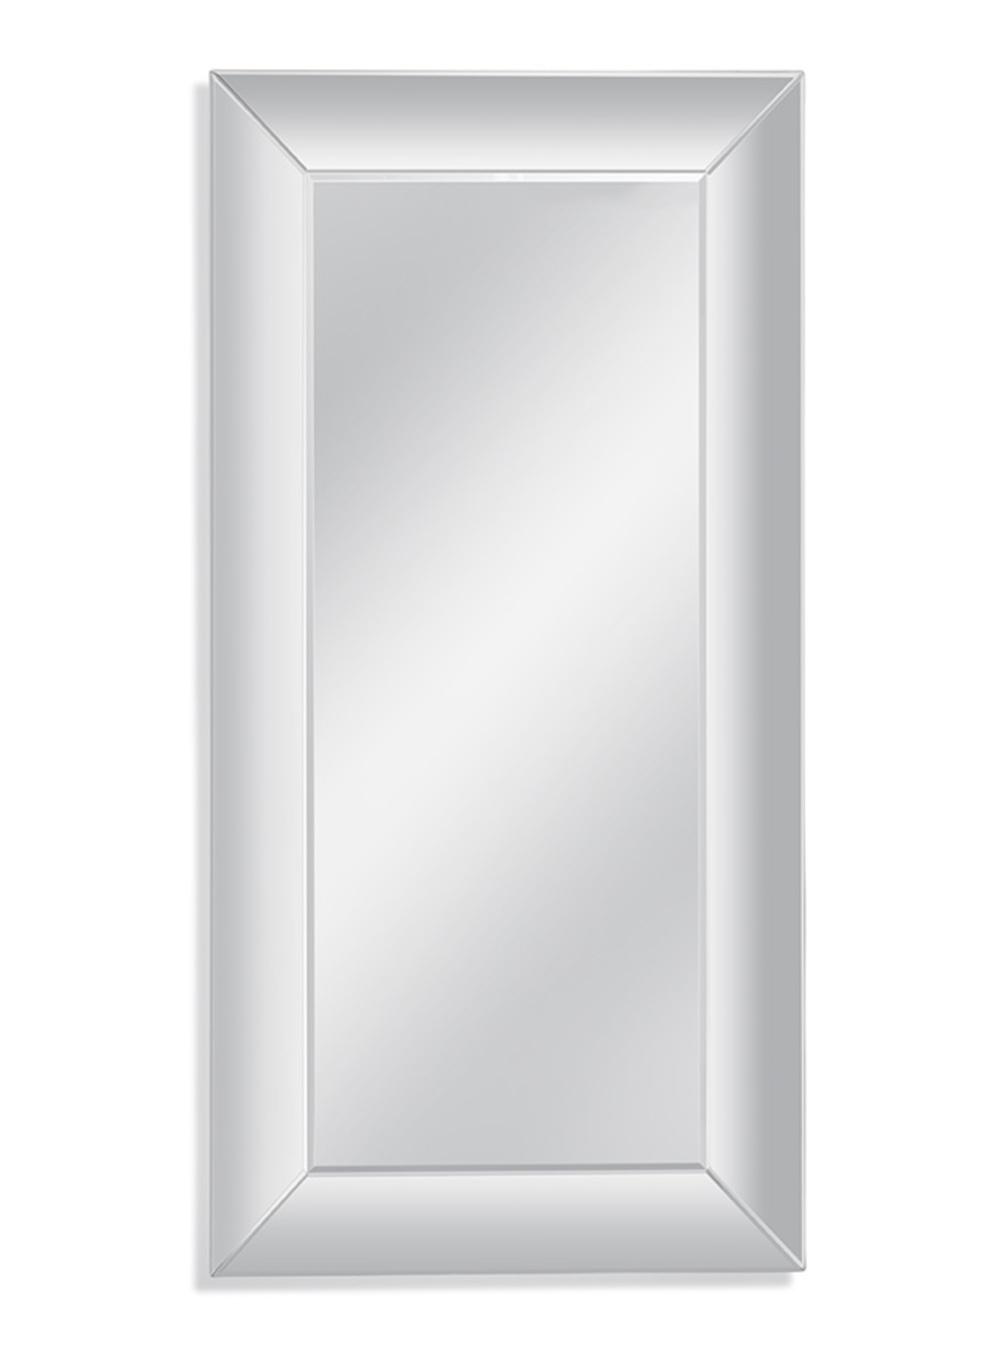 Bassett Mirror Company - Holland Leaner Mirror